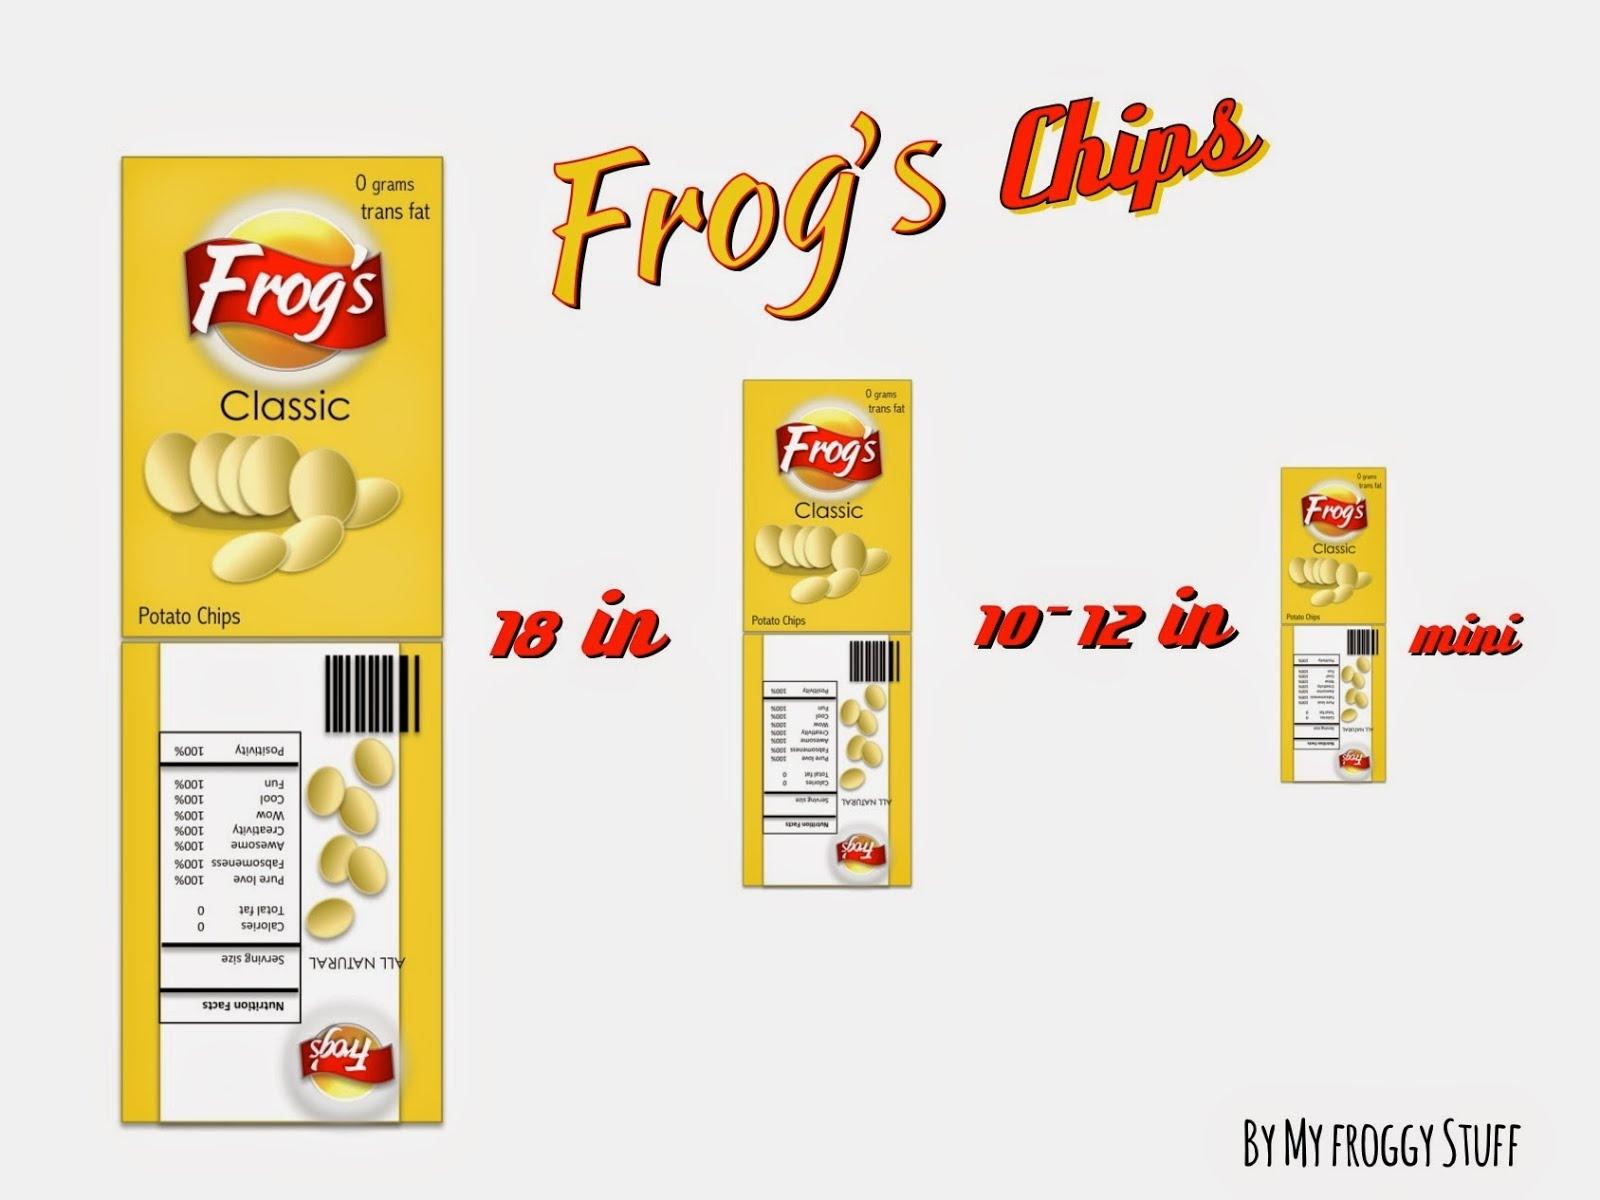 My Froggy Stuff: Printing Printables Has Changed - Myfroggystuff Blogspot Free Printables